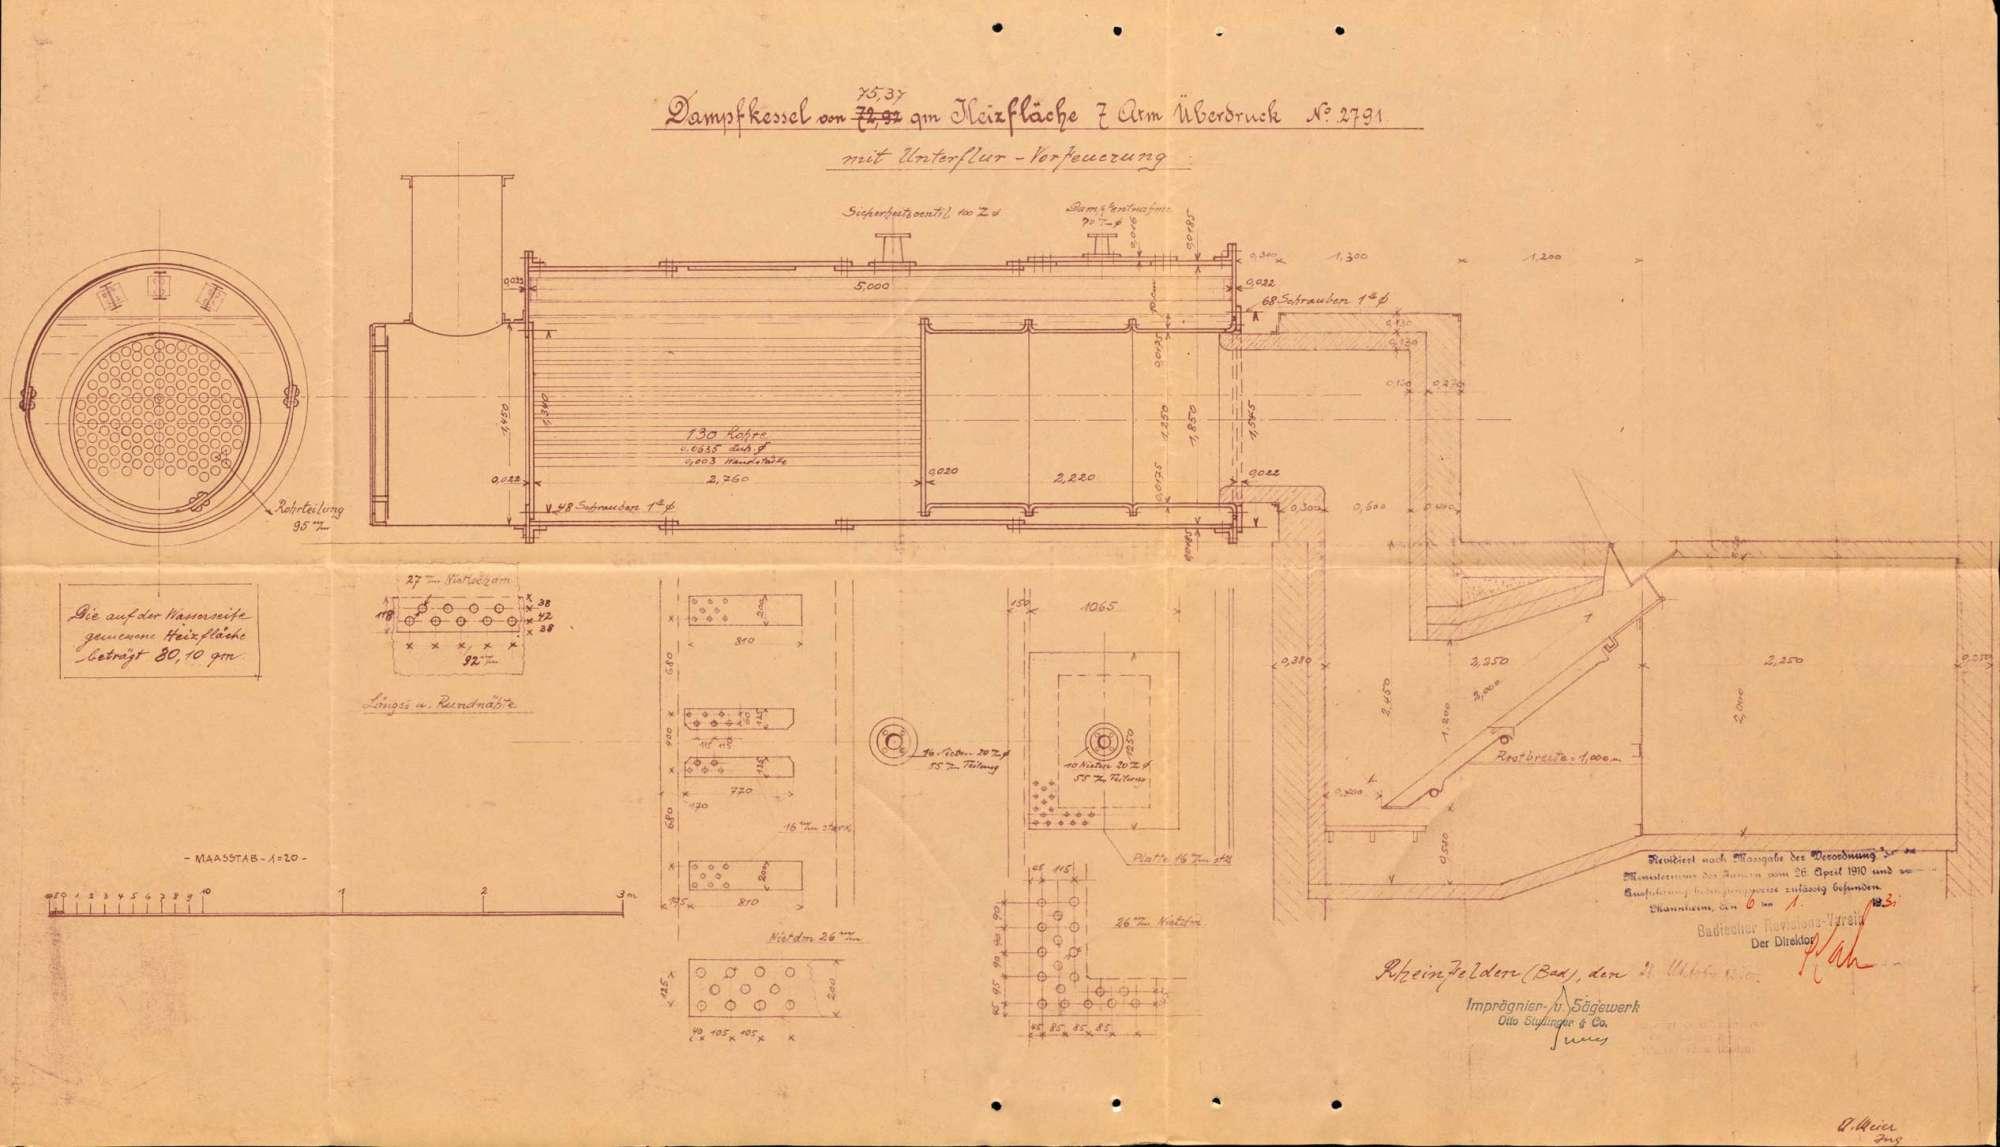 Dampfkessel der Firma Sägewerk Otto Studinger & Co. in Rheinfelden (Baden), Bild 3